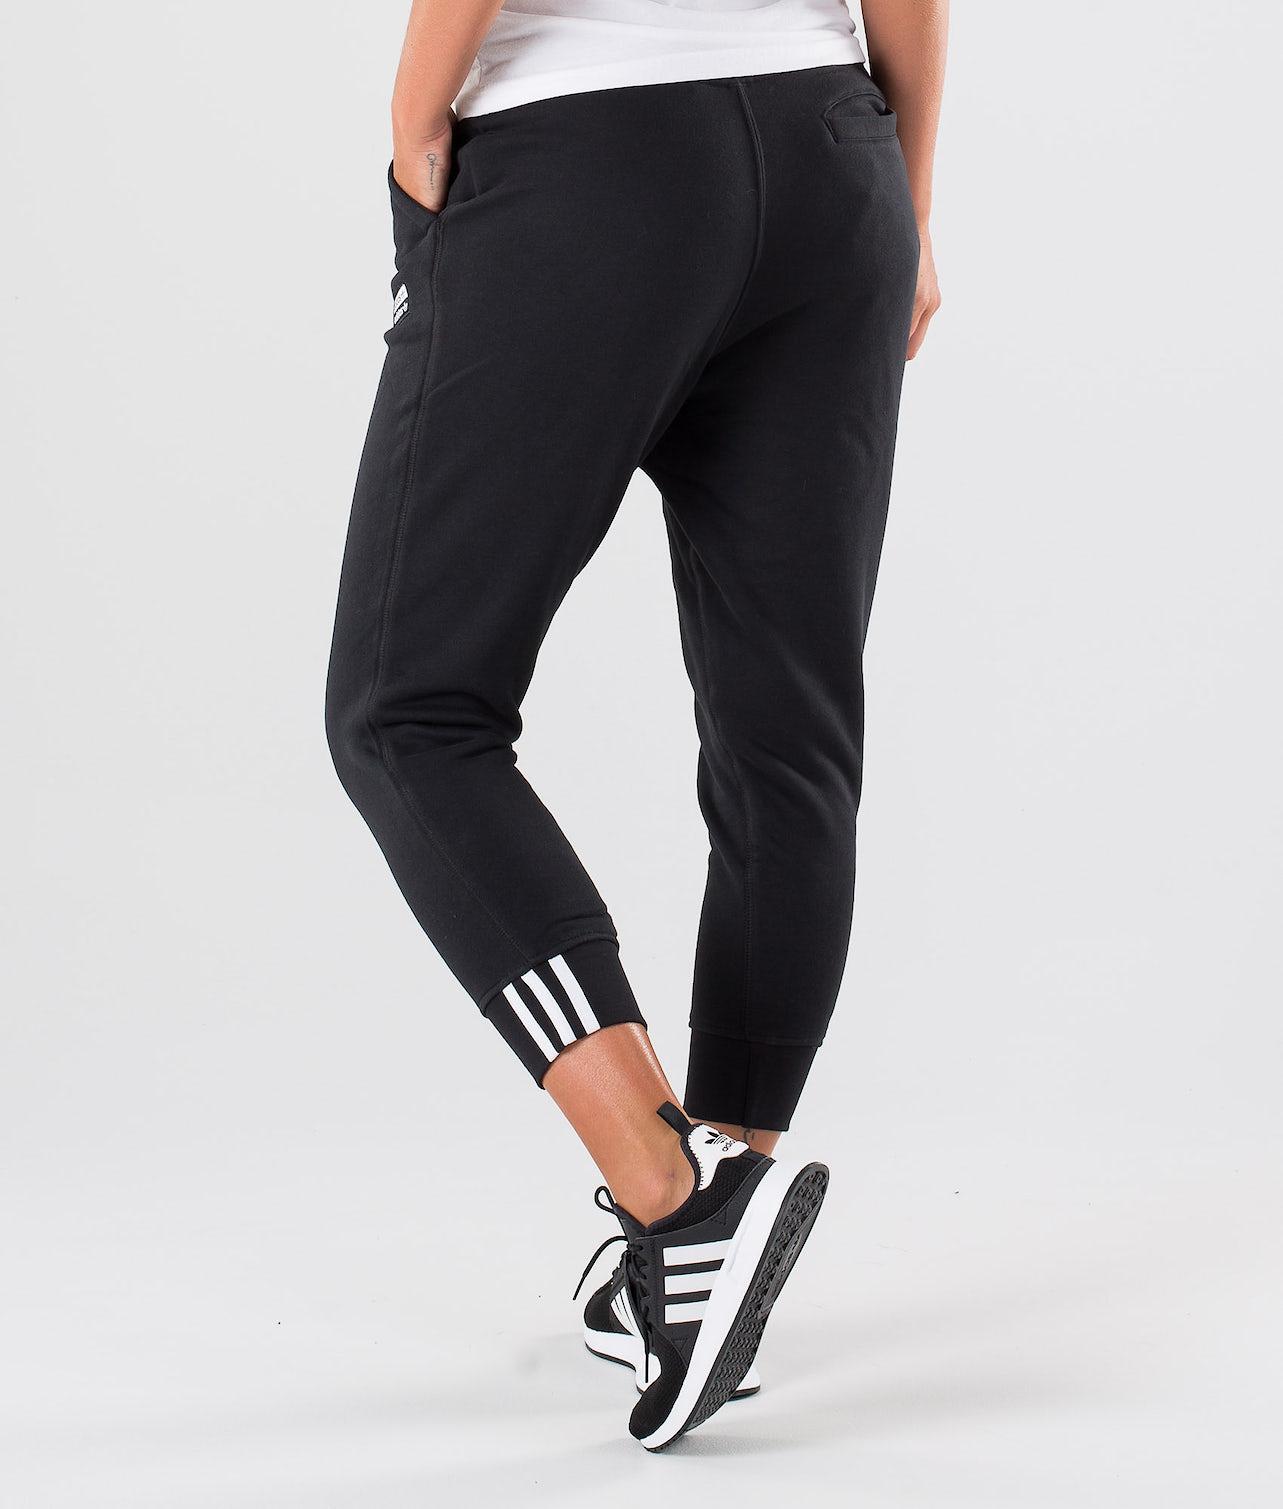 Adidas Originals Pant. Bukser Black